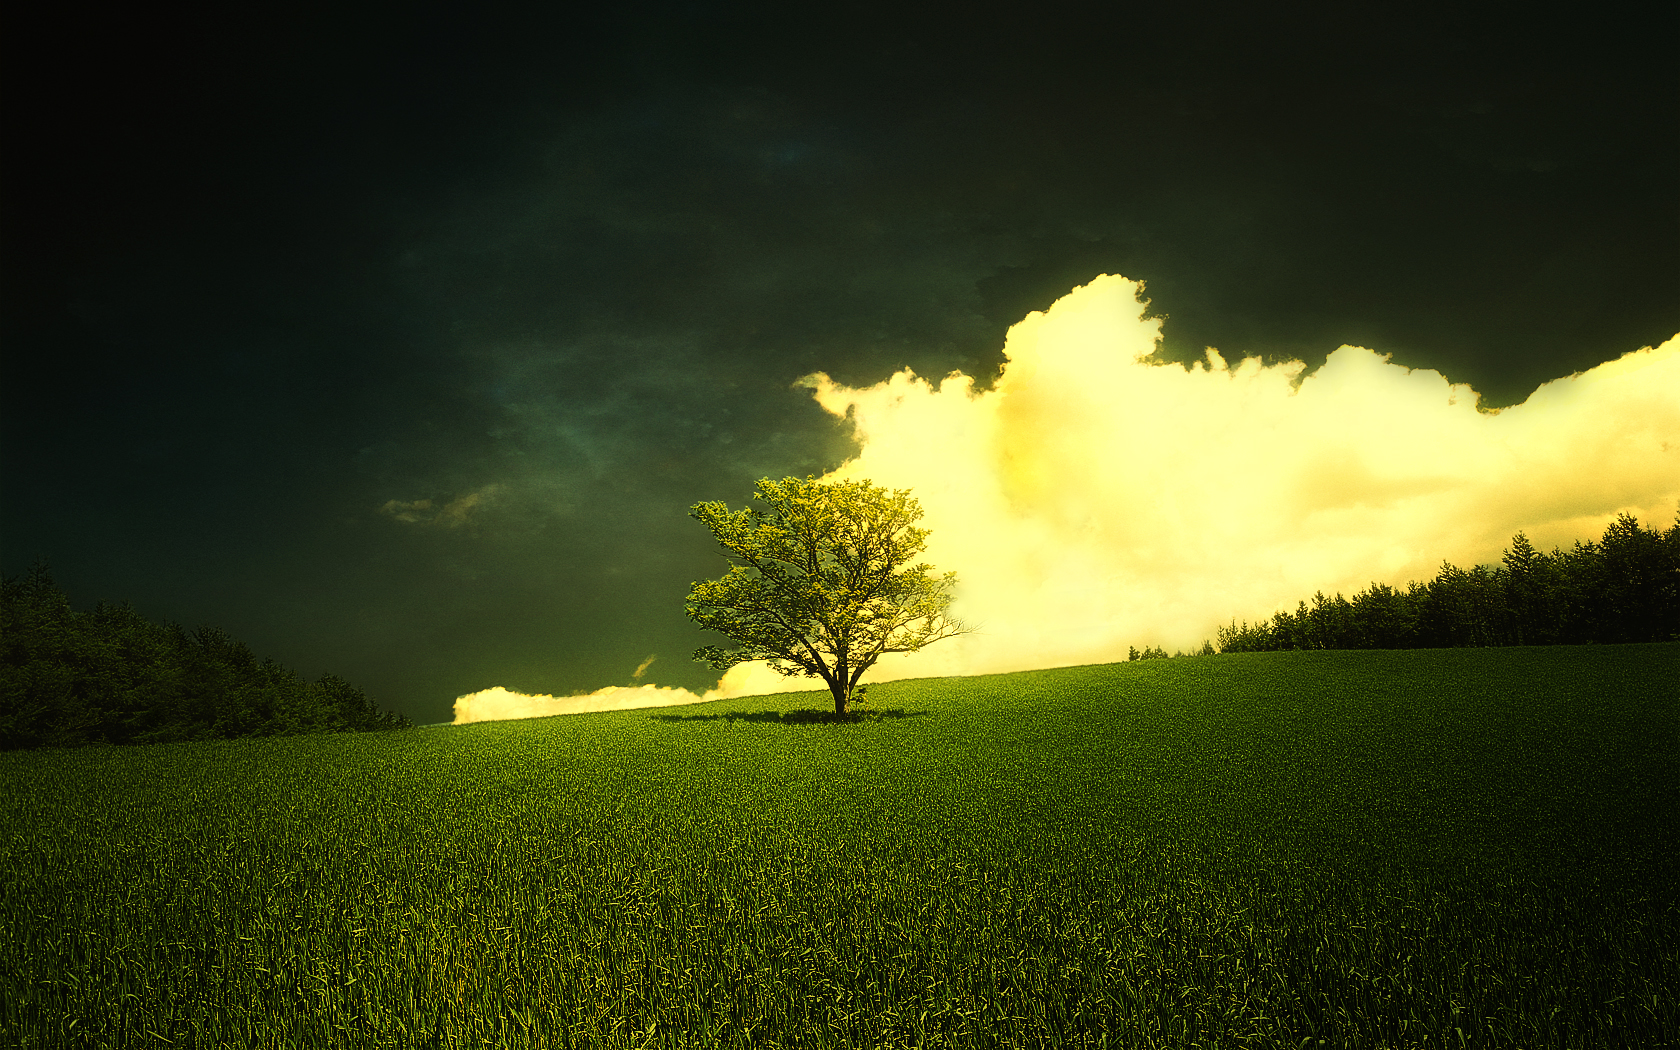 Sfondi hd natura paesaggio bucolico sfondi hd gratis for Sfondi hd natura